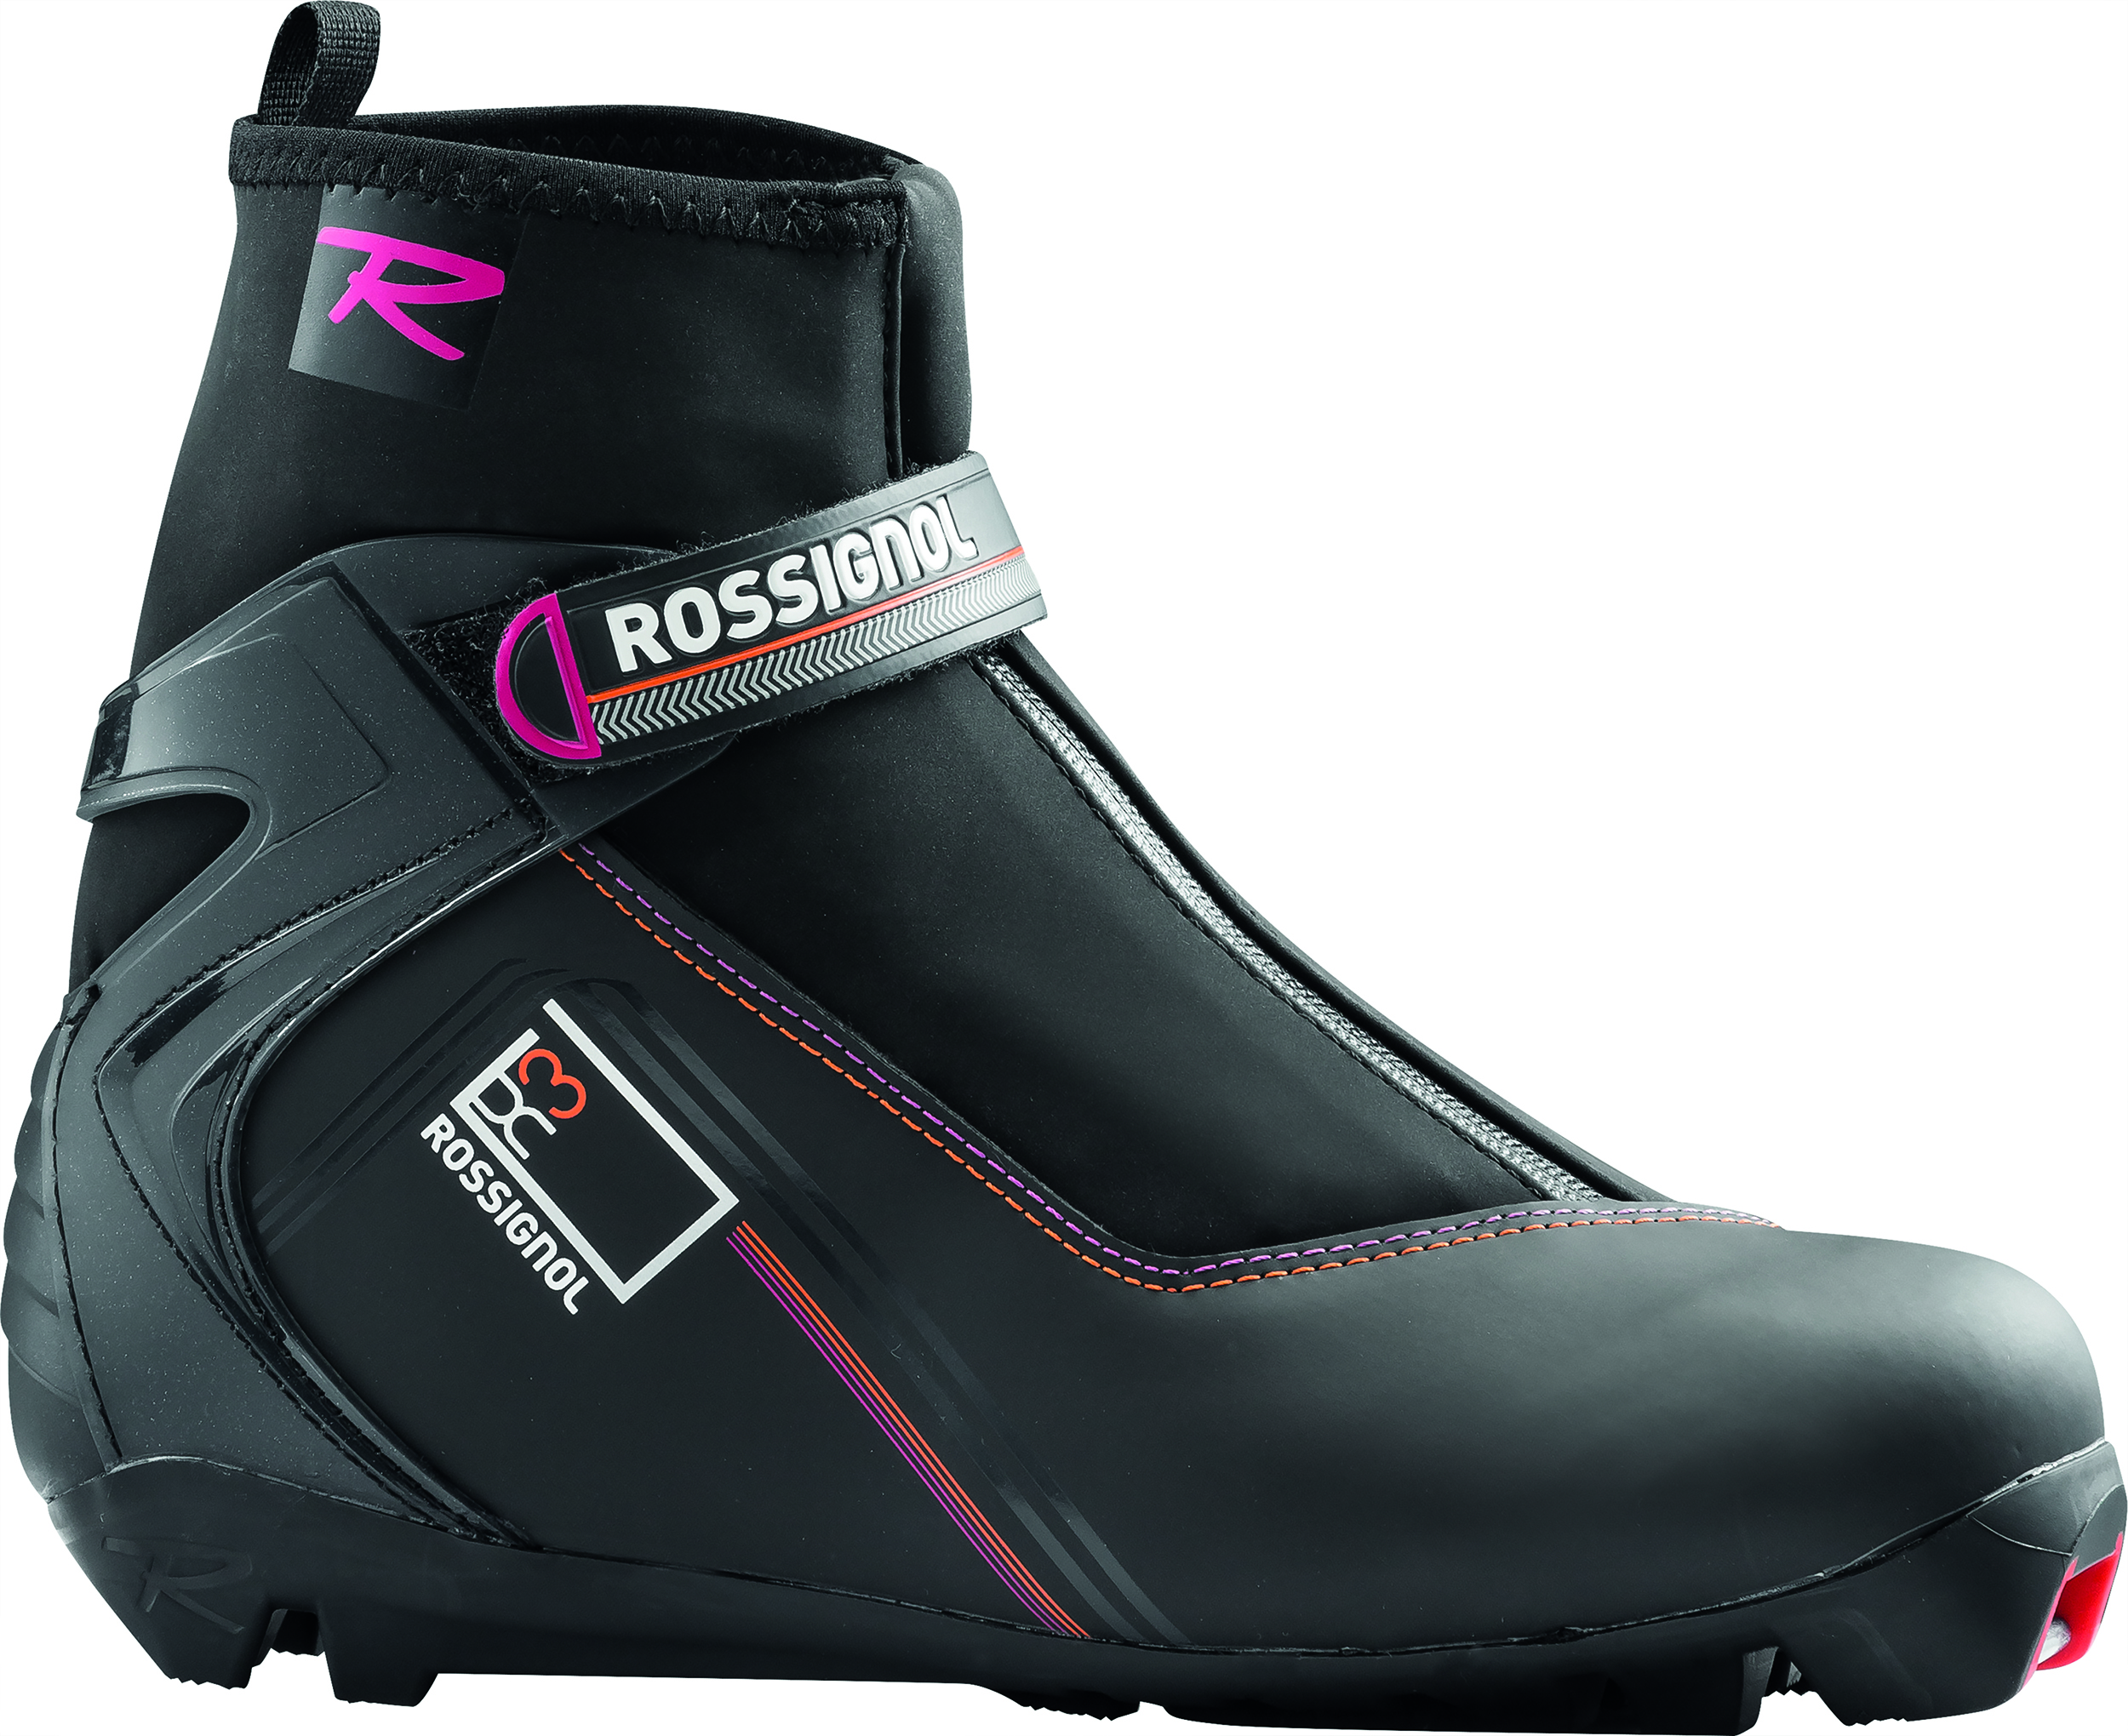 7ae483dfc2 Classic cross-country ski gear